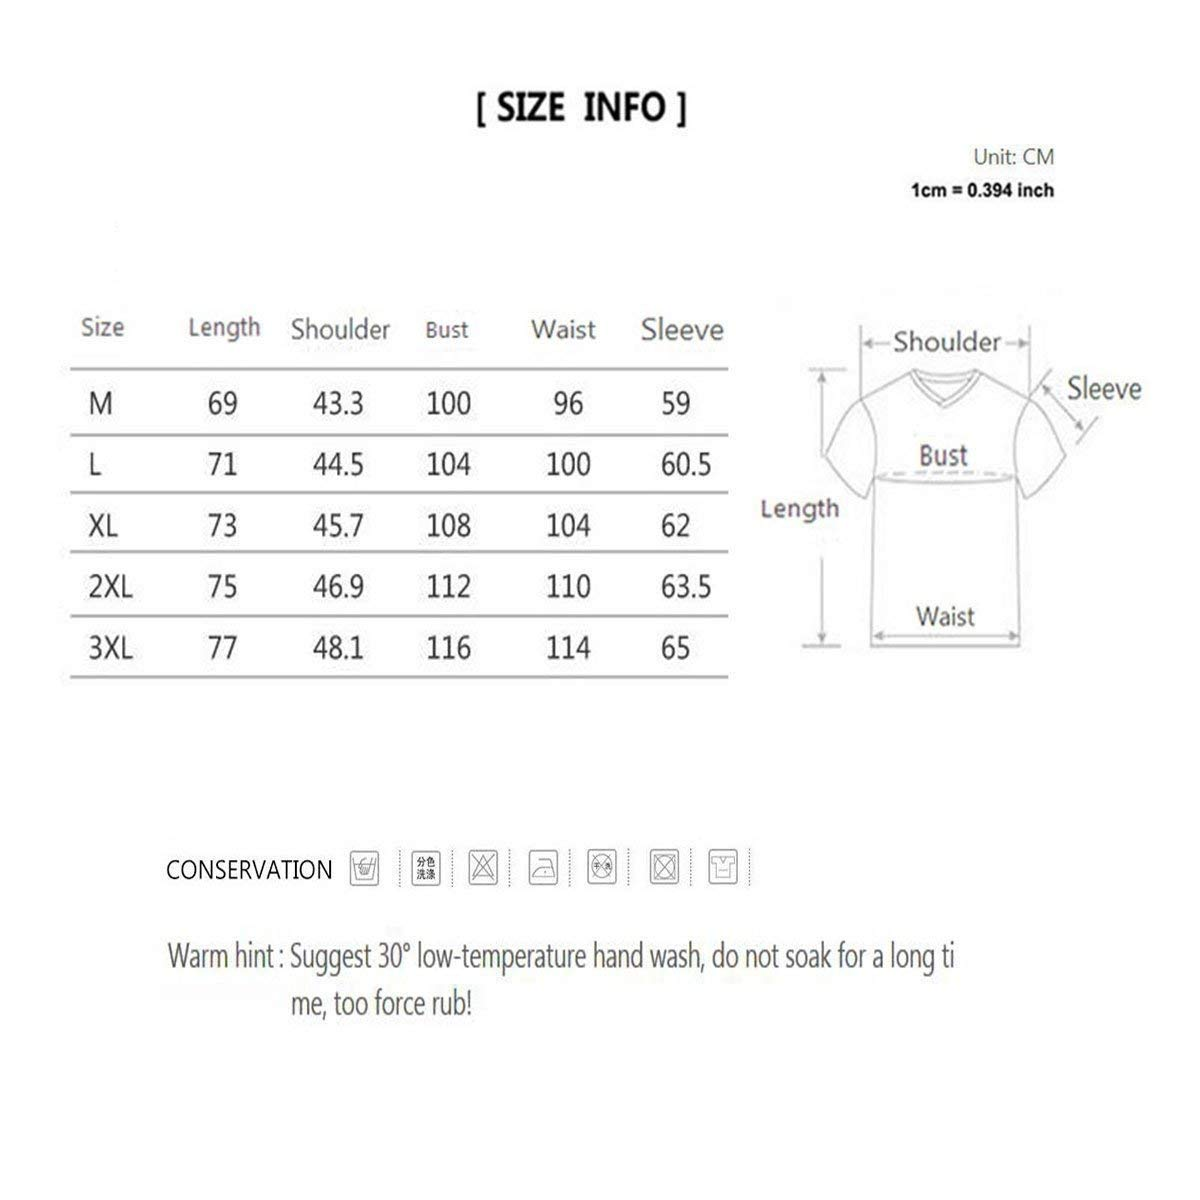 Hzf Camisa De Algodón O Polo Hombres De Hombres Invierno Camiseta para Mode De Marca Hombre Solapa Cabeza Caballero Business Suite Camisetas De Manga Larga: ...